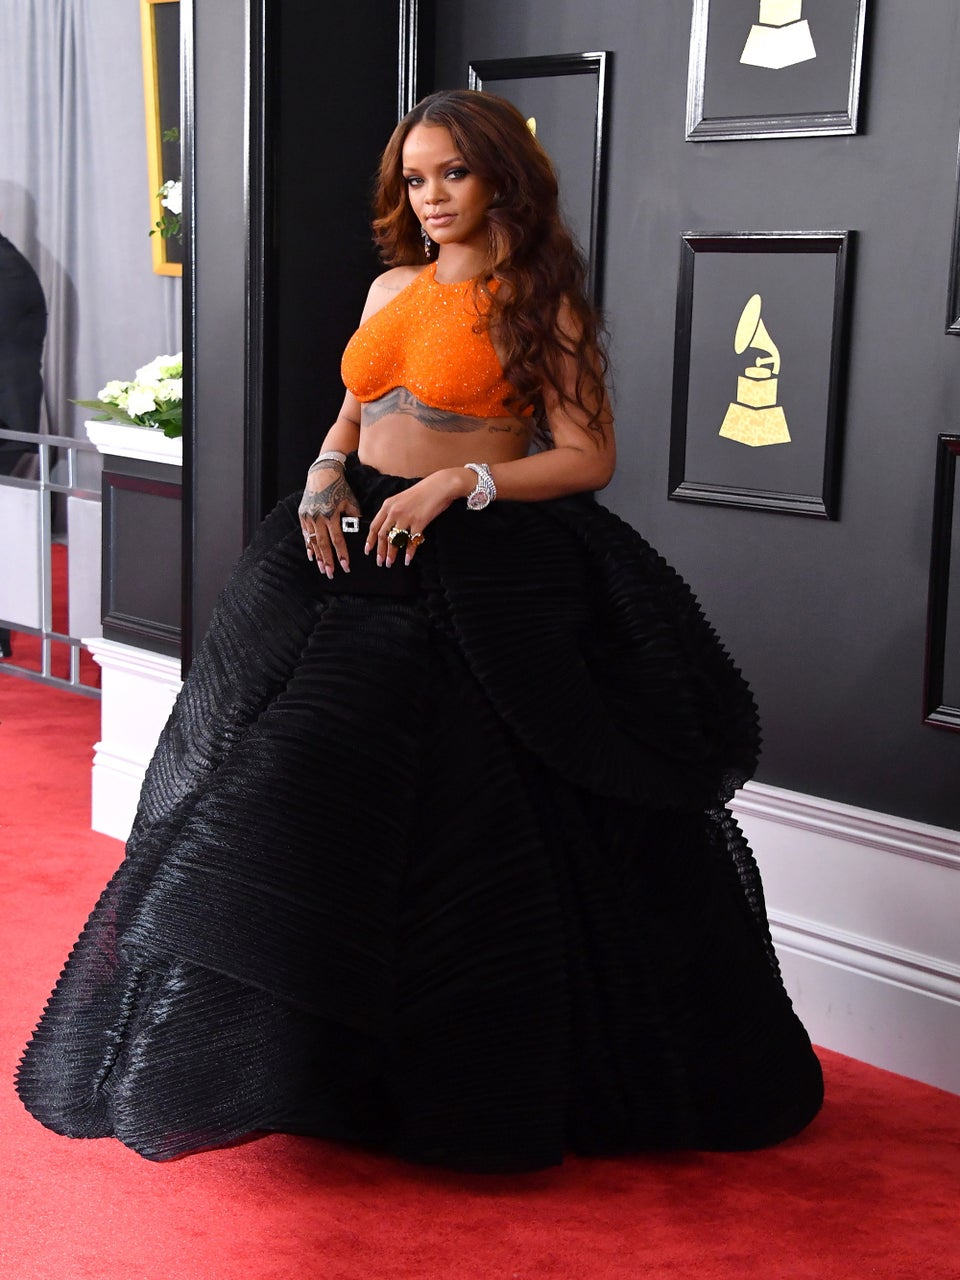 Rihanna Rocks Sparkly Orange Crop Top On Grammy Awards Red Carpet